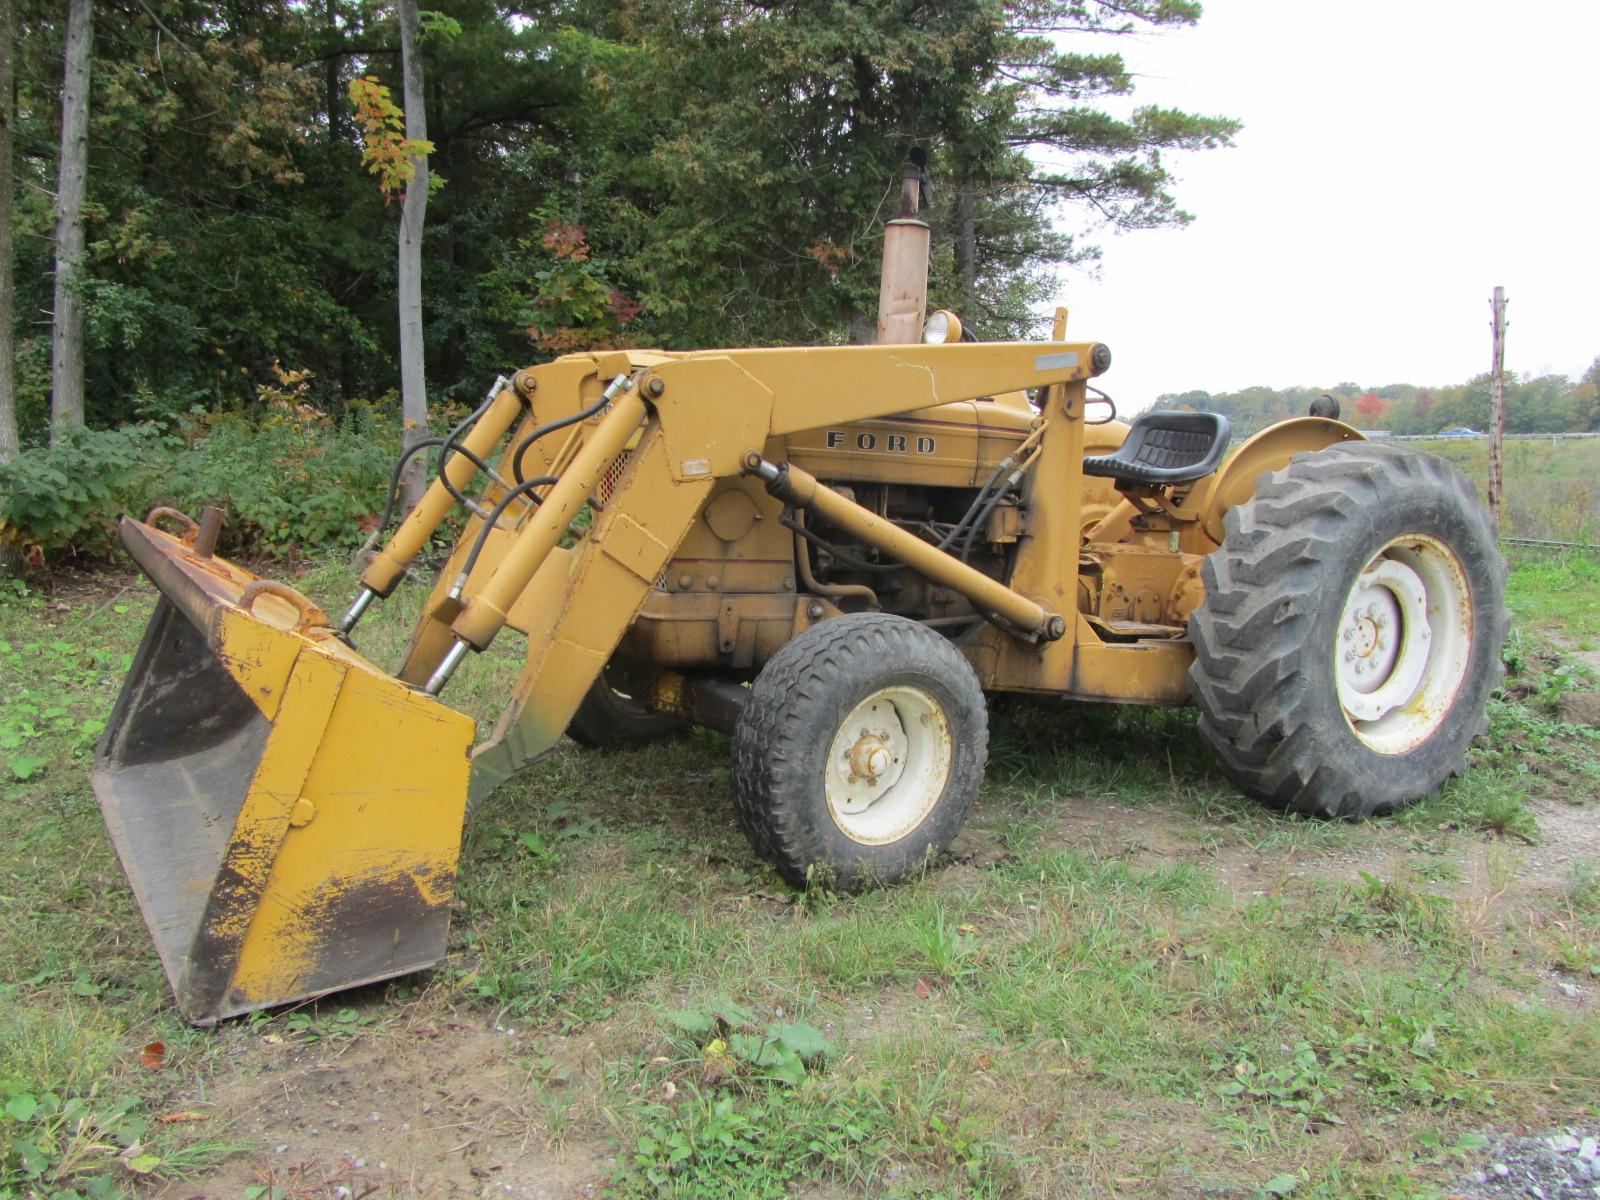 Ford 4500 Tractor Wiring Diagram 12v Gehl 140267d1253264114 1980 A Dert Fox Power 4600